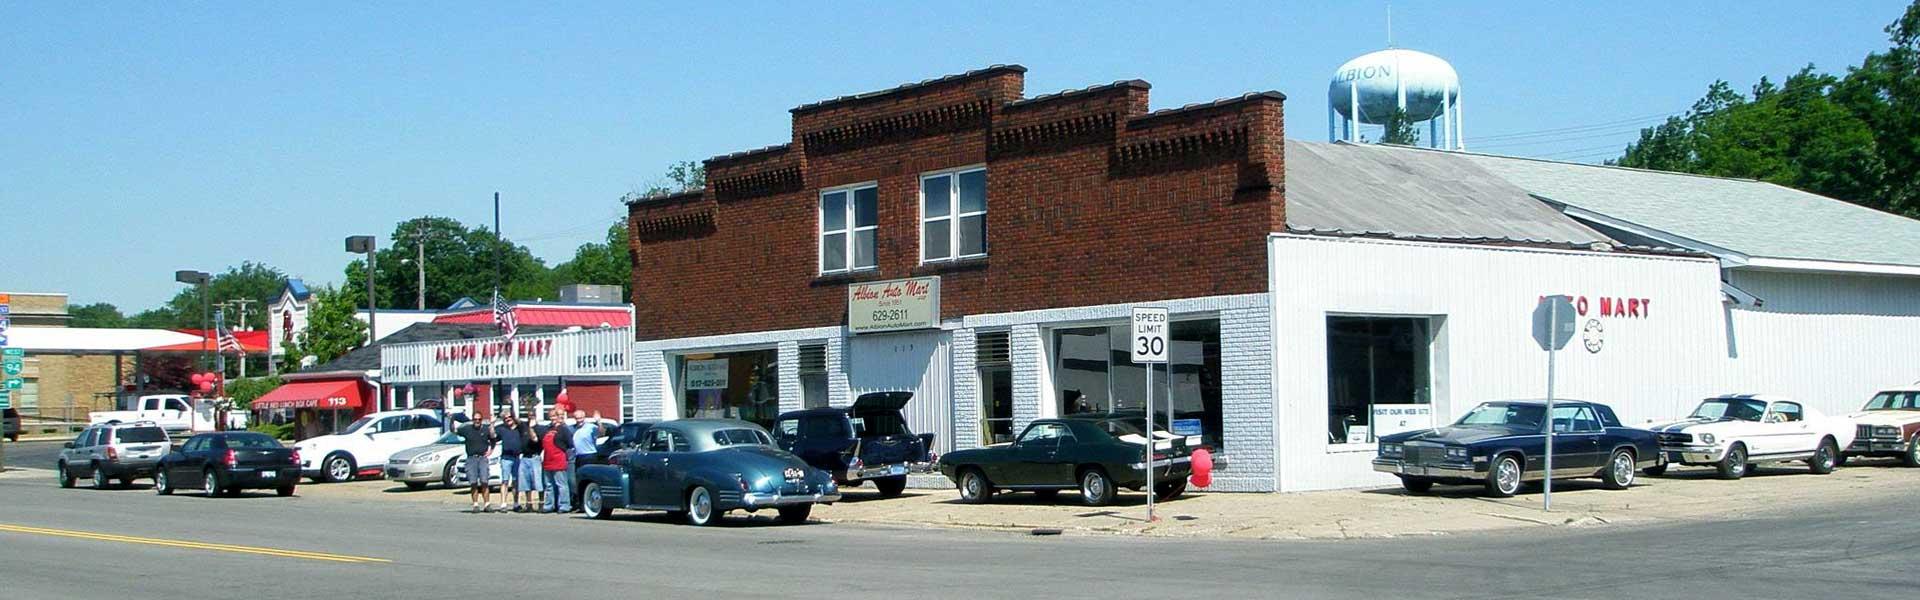 Albion Auto Mart LLC - Used Cars - Albion MI Dealer